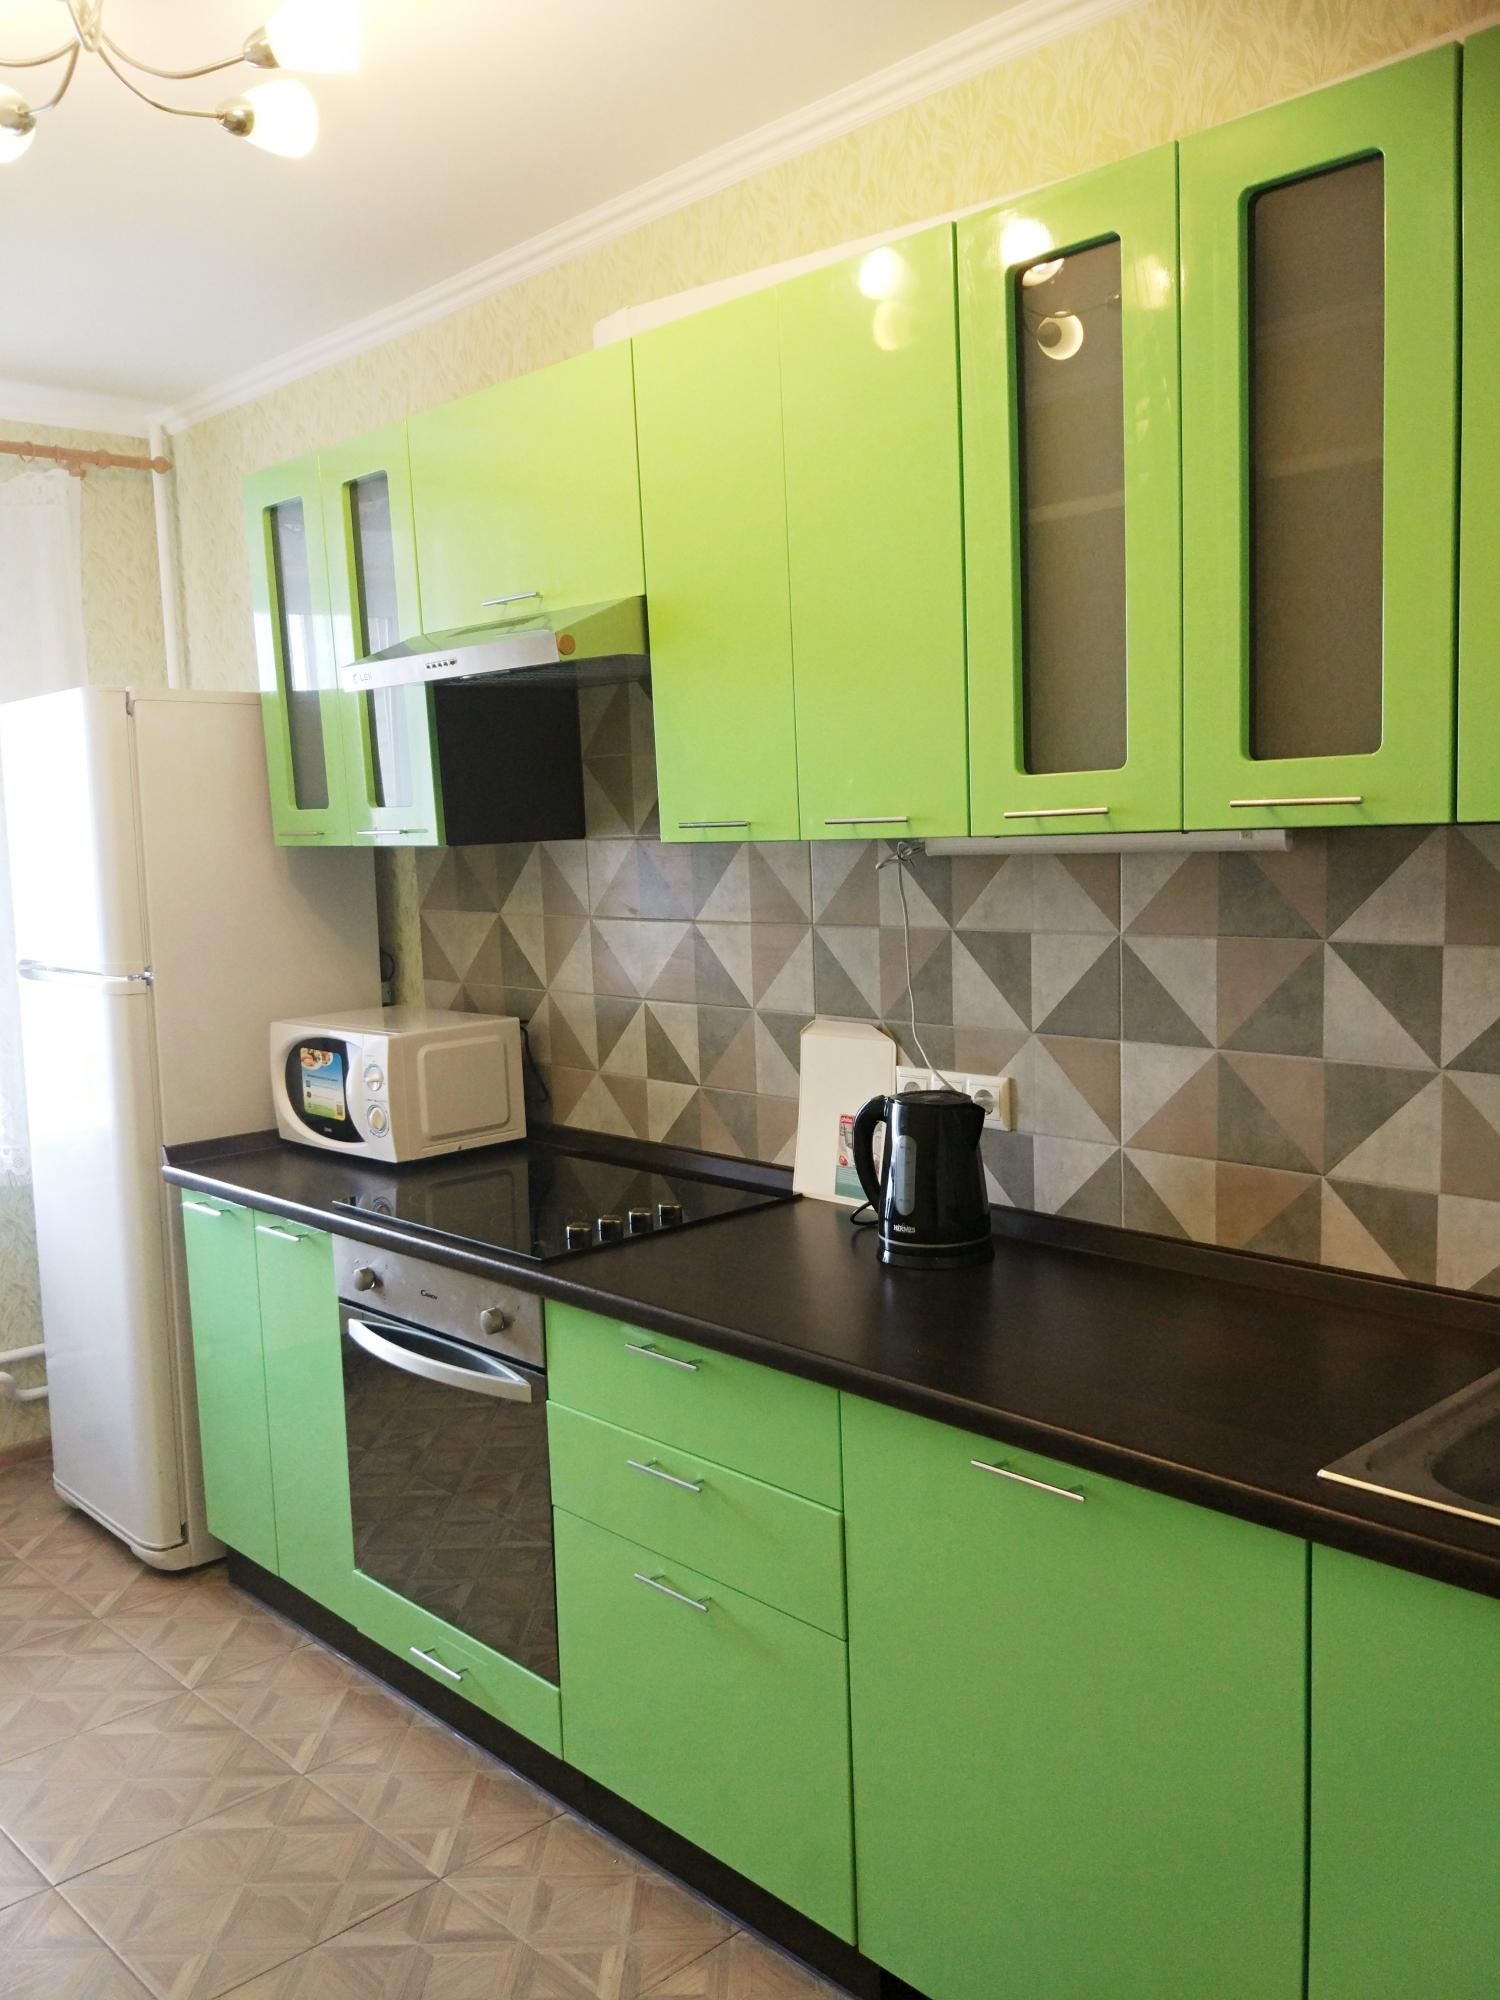 Квартира, 1 комната, 38 м² в Климовске 89258731076 купить 5